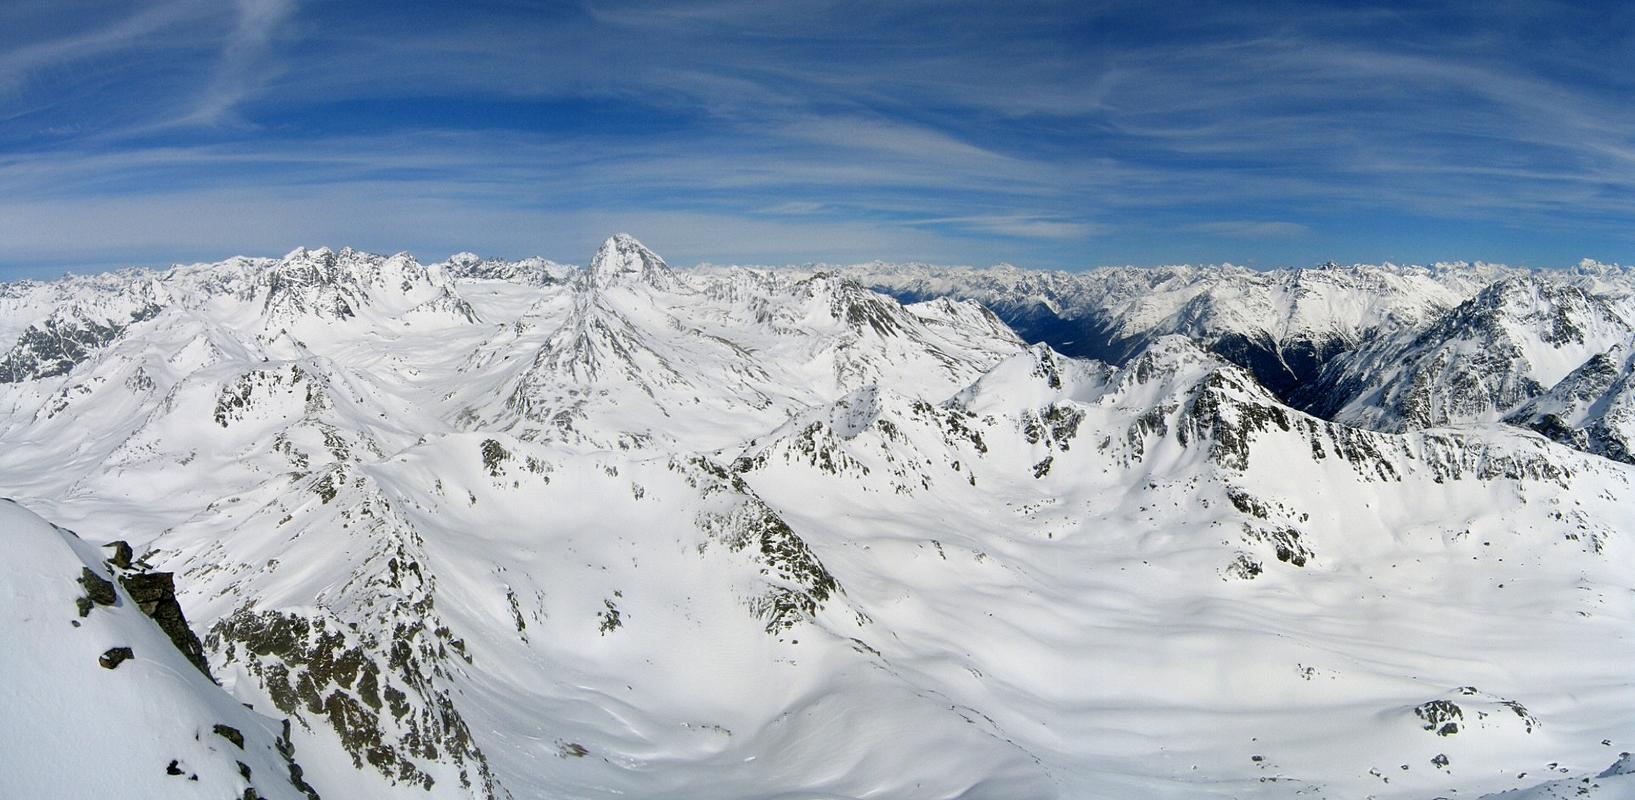 Flüela Wisshorn Albula Alpen Švýcarsko panorama 23